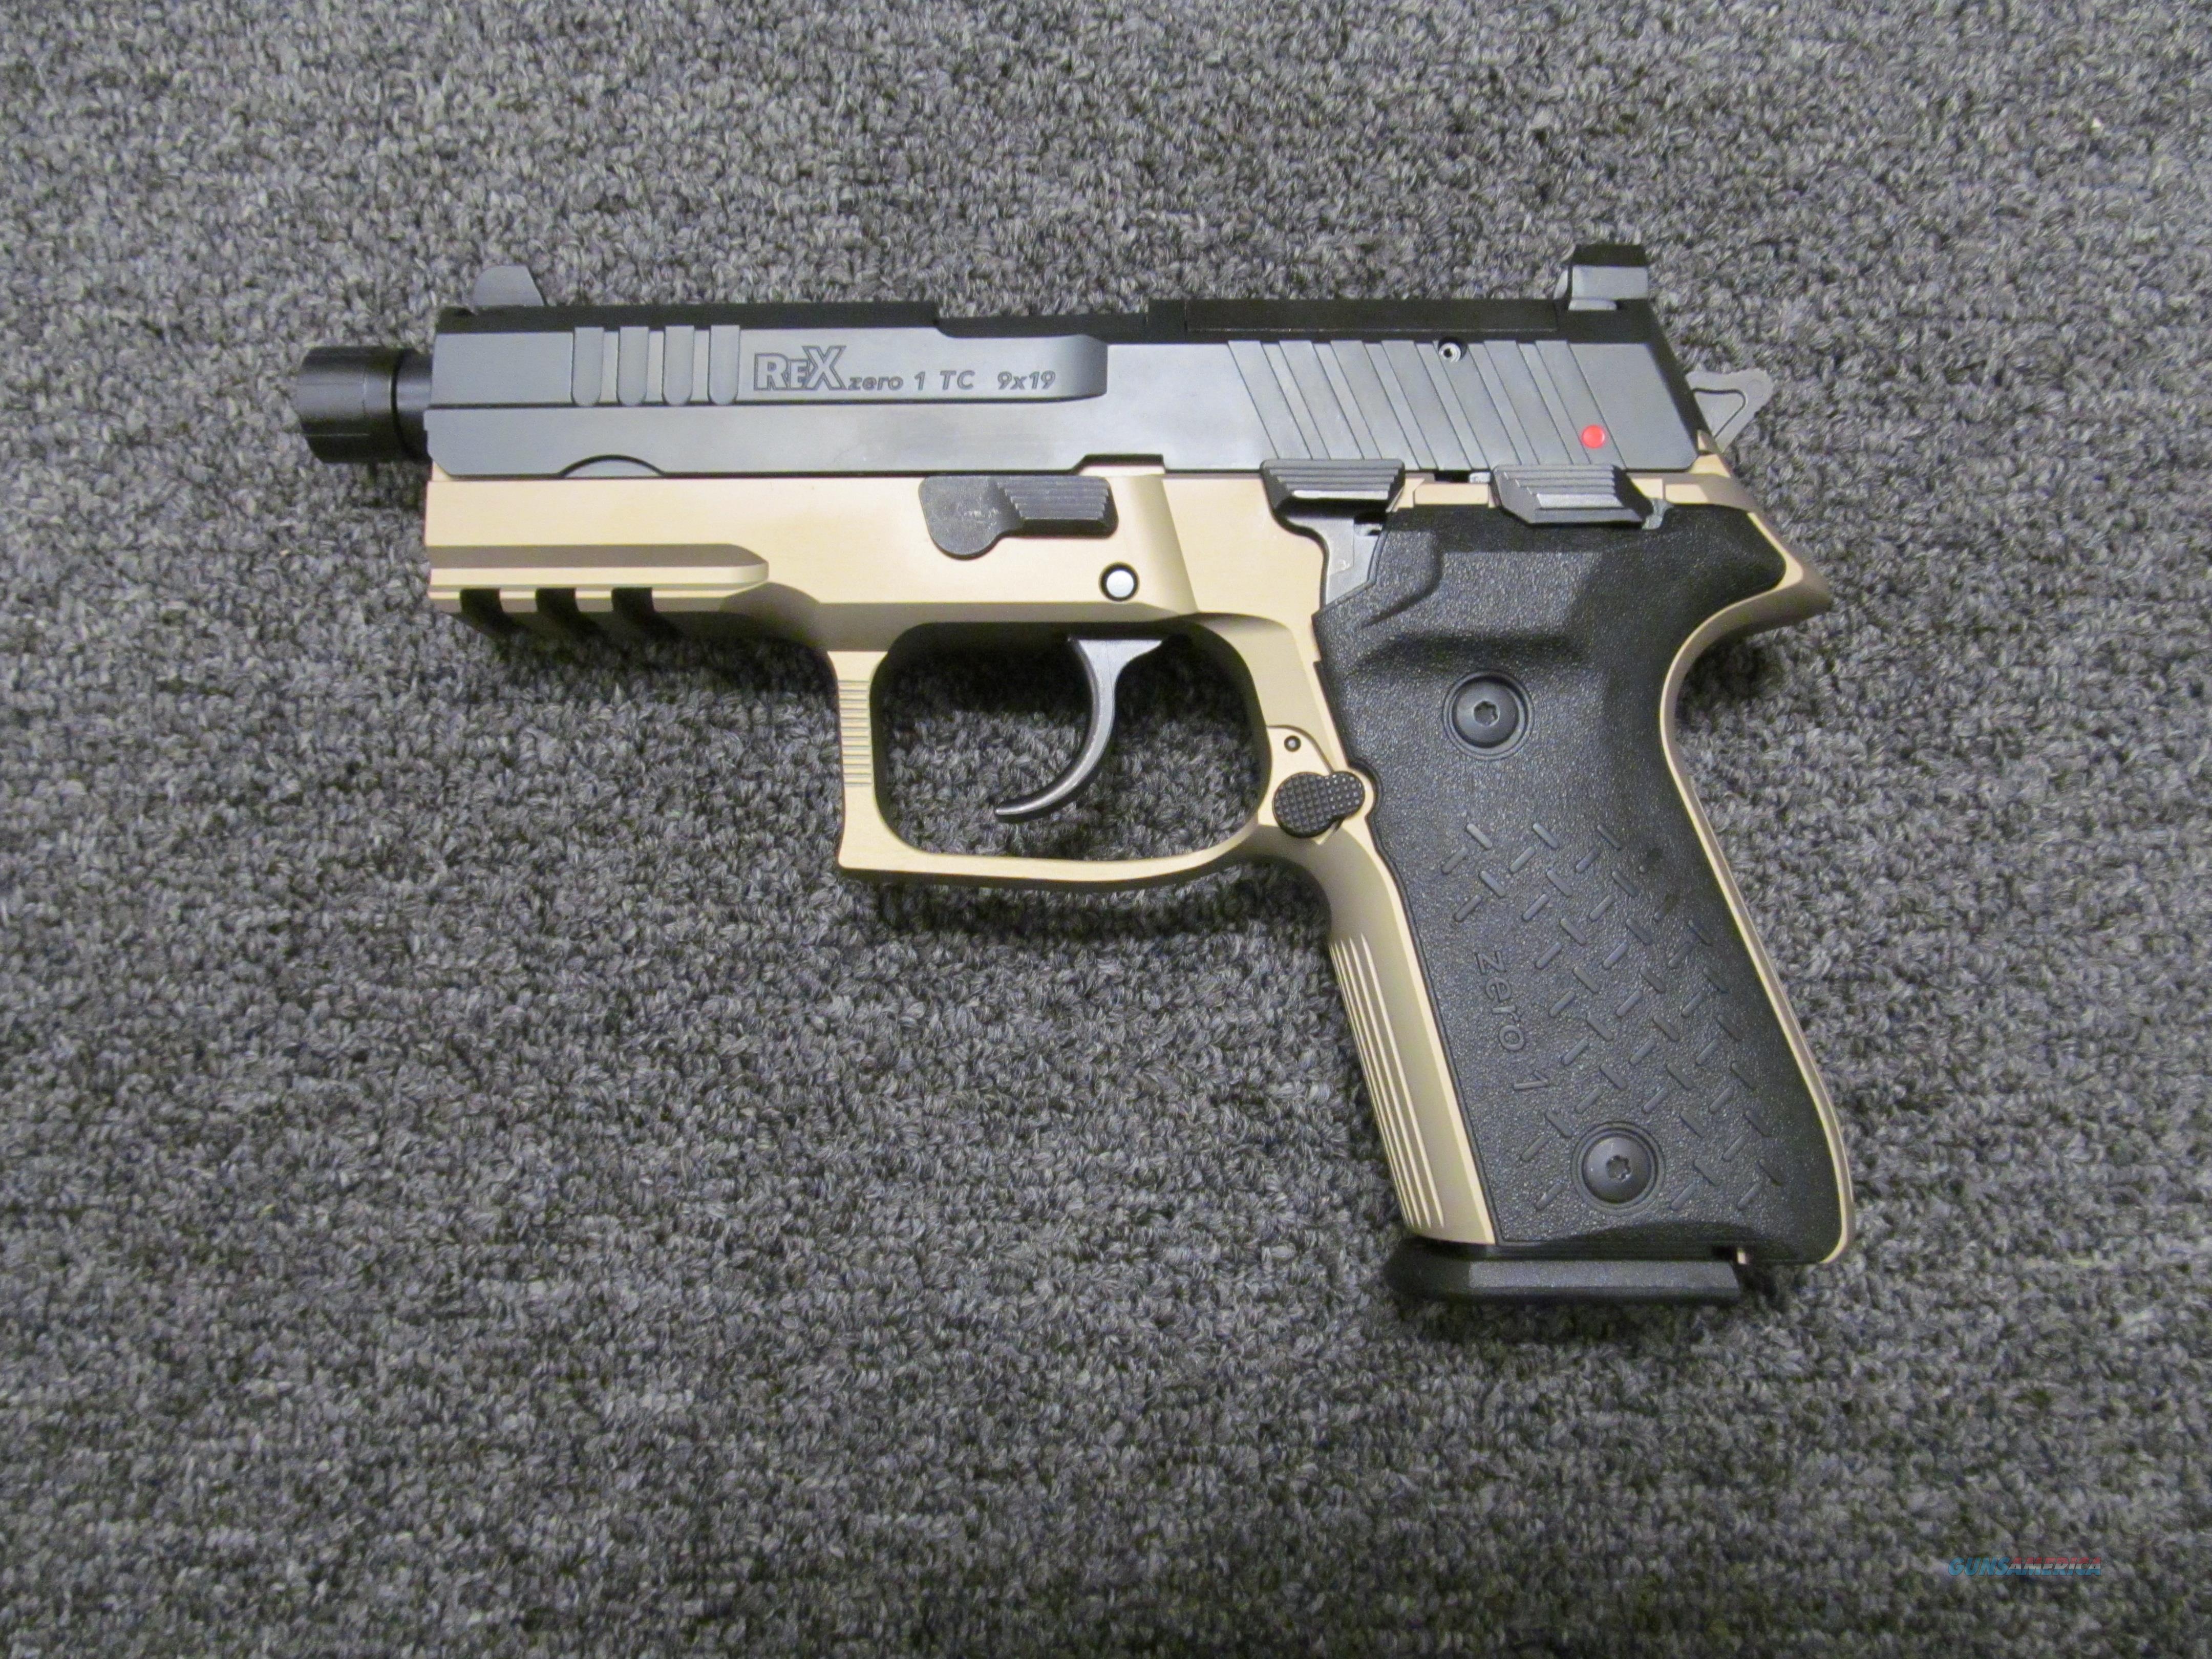 Arex/Fime Group Rex Zero 1TC 9mm Compact  Guns > Pistols > FIME Group Pistols > Rex Zero 1